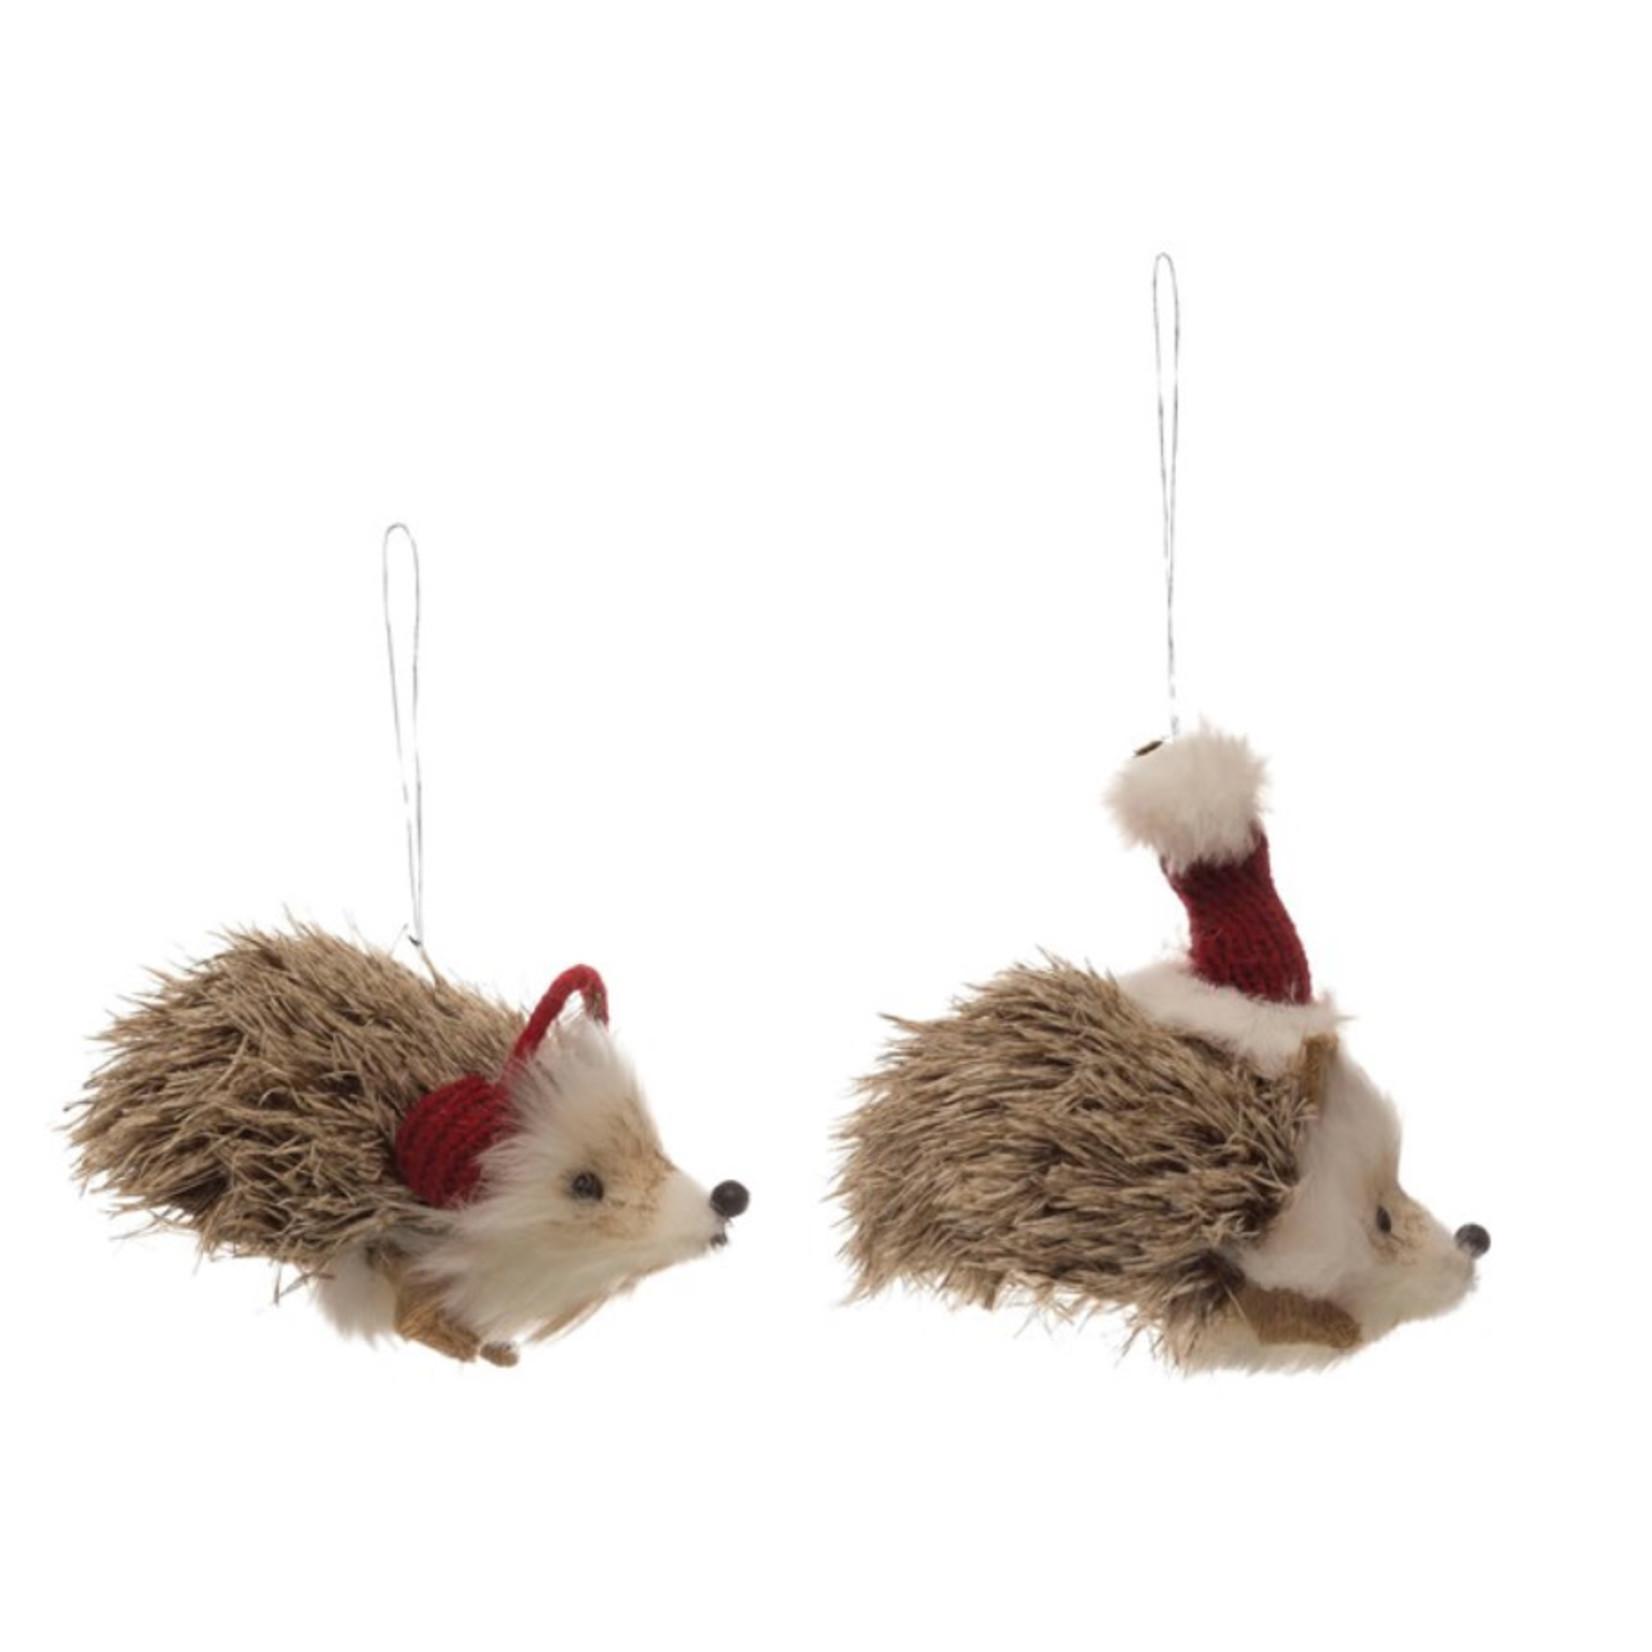 "Creative co-op 5""L Faux Fur Hedgehog Ornament, 2 Styles"